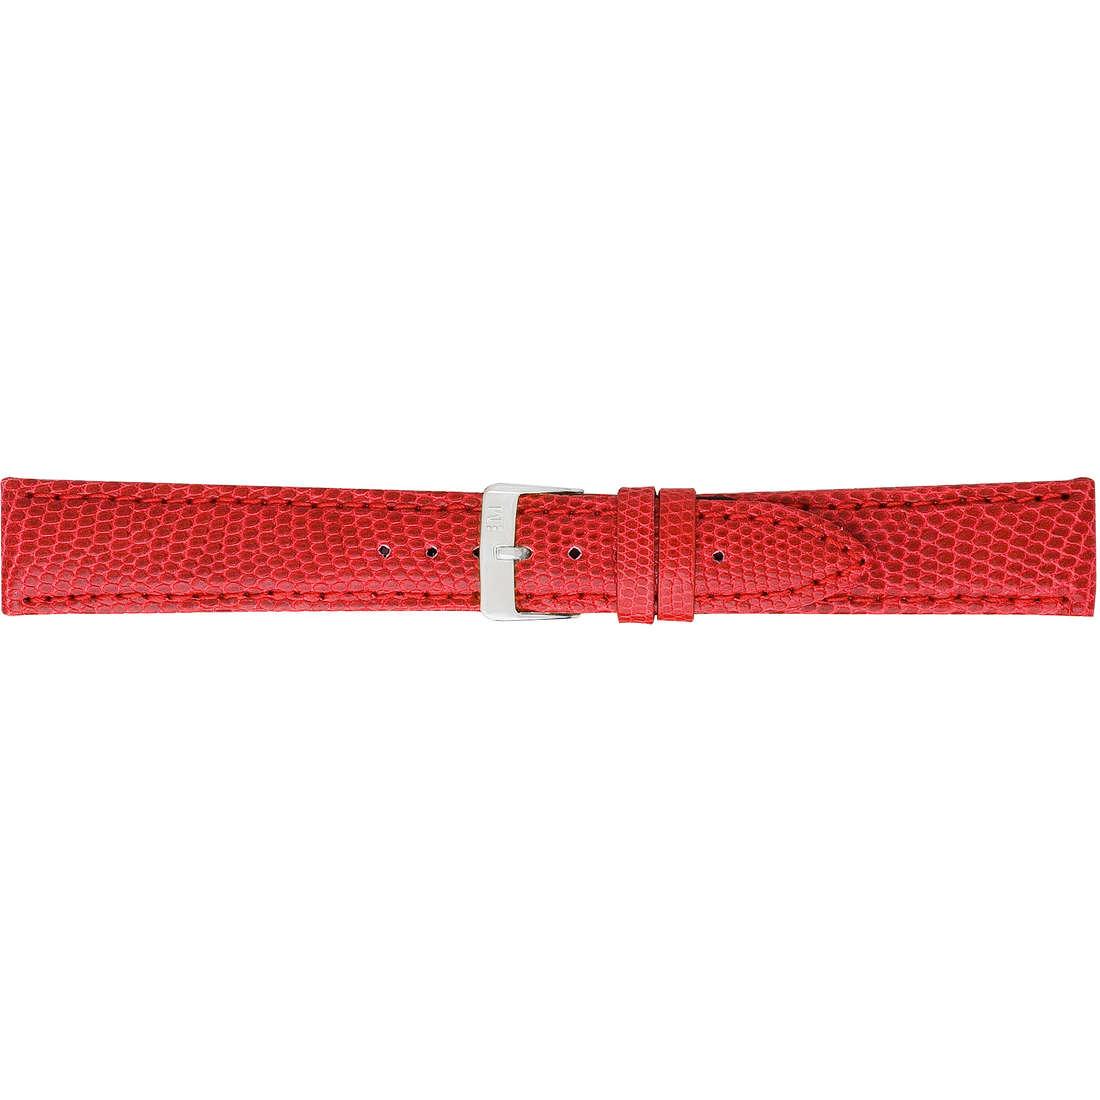 watch watch bands watch straps man Morellato Pelli Preziose A01X2053372083CR14